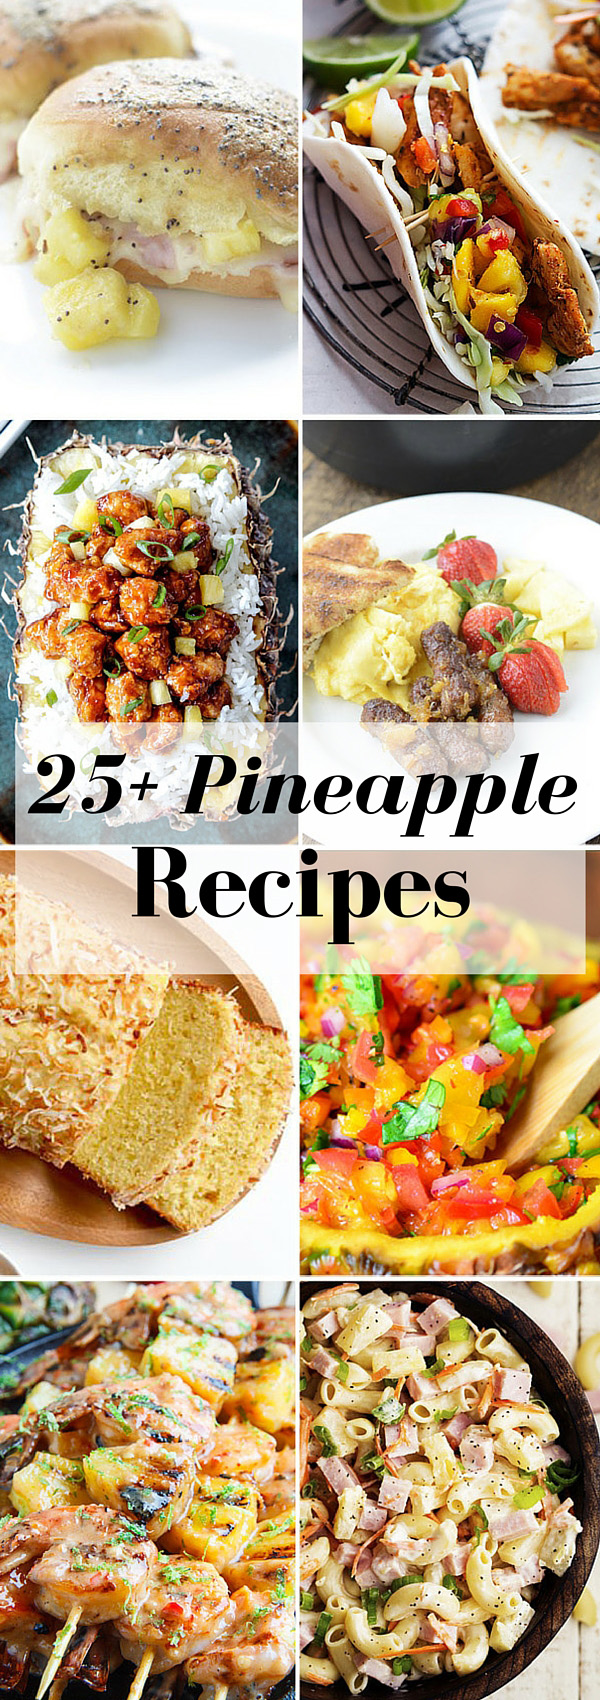 25+ Pineapple Recipes   NoBiggie.net